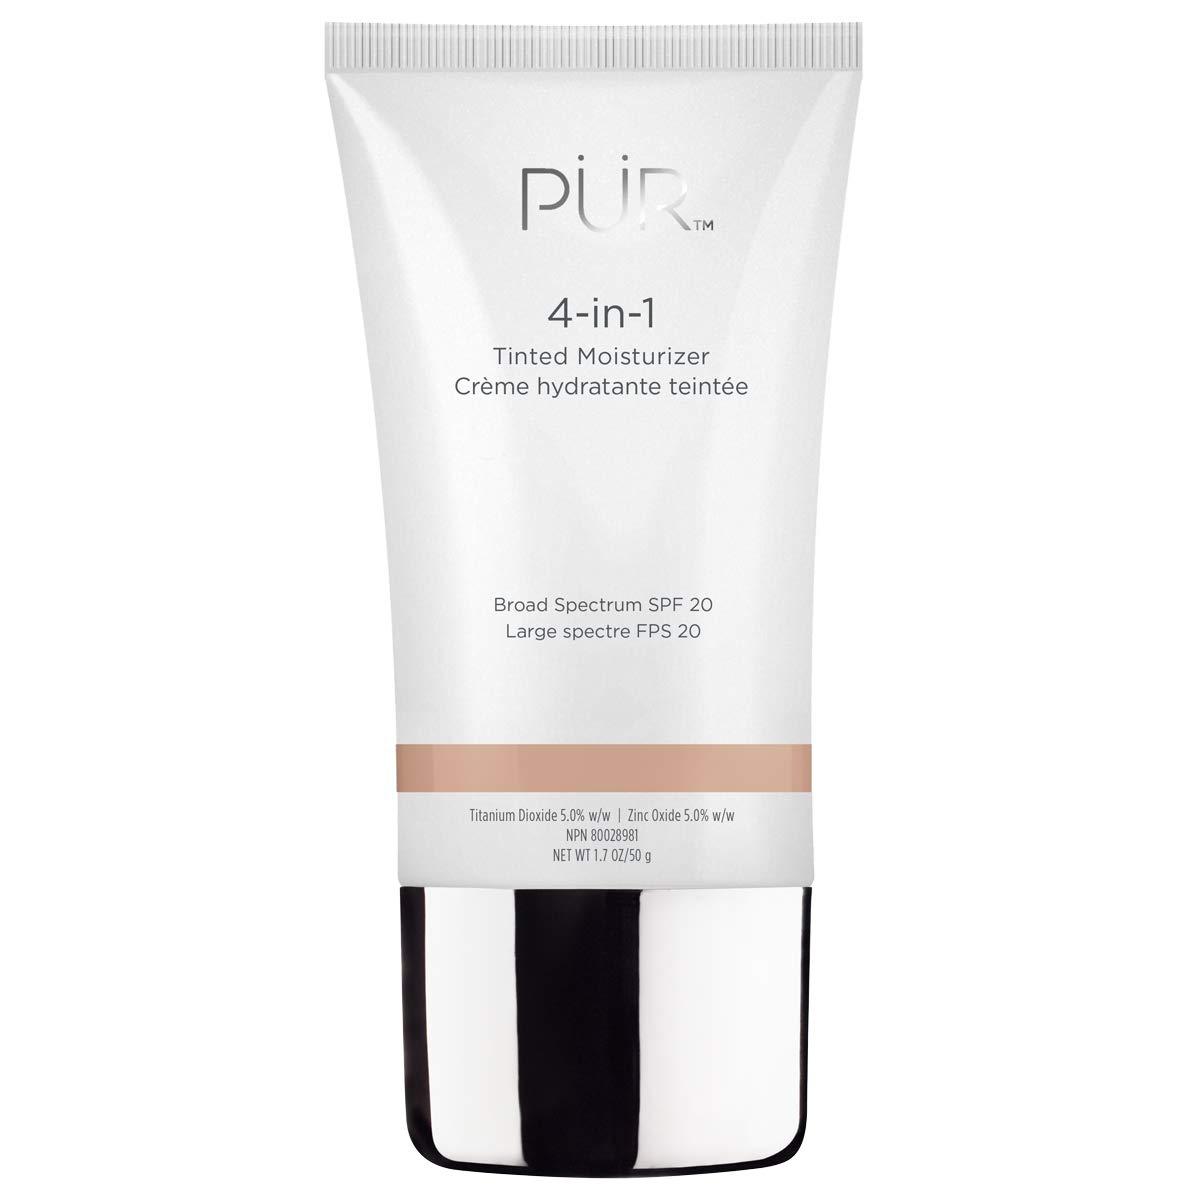 PUR Cosmetics 4-in-1 Tinted Moisturizer in Bone, 1.7 oz